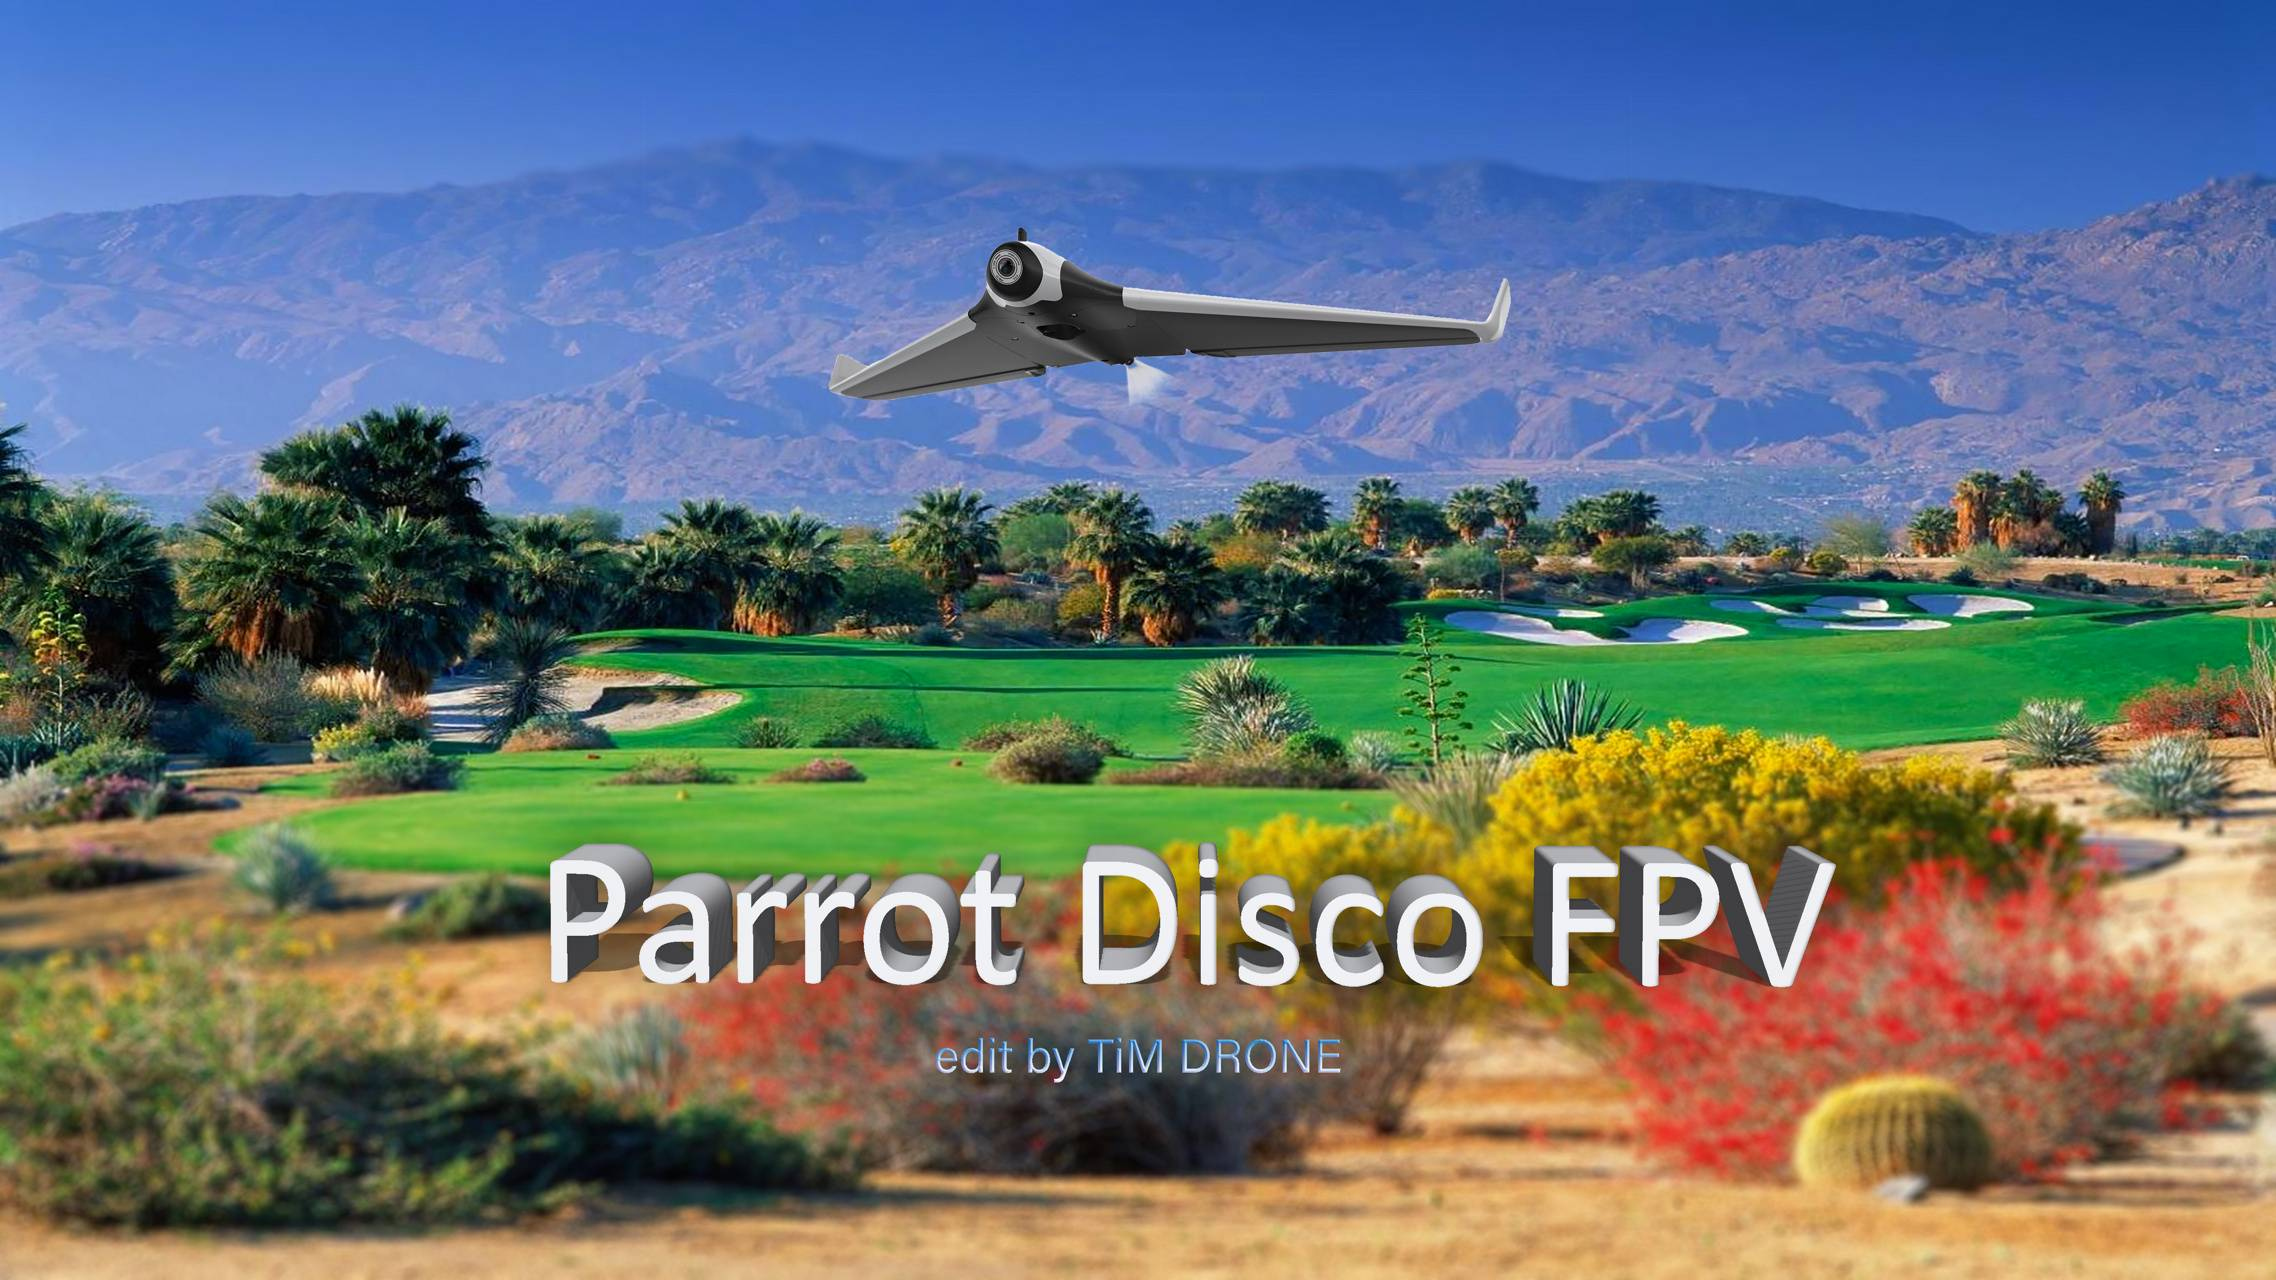 PARROT DISCO FPV